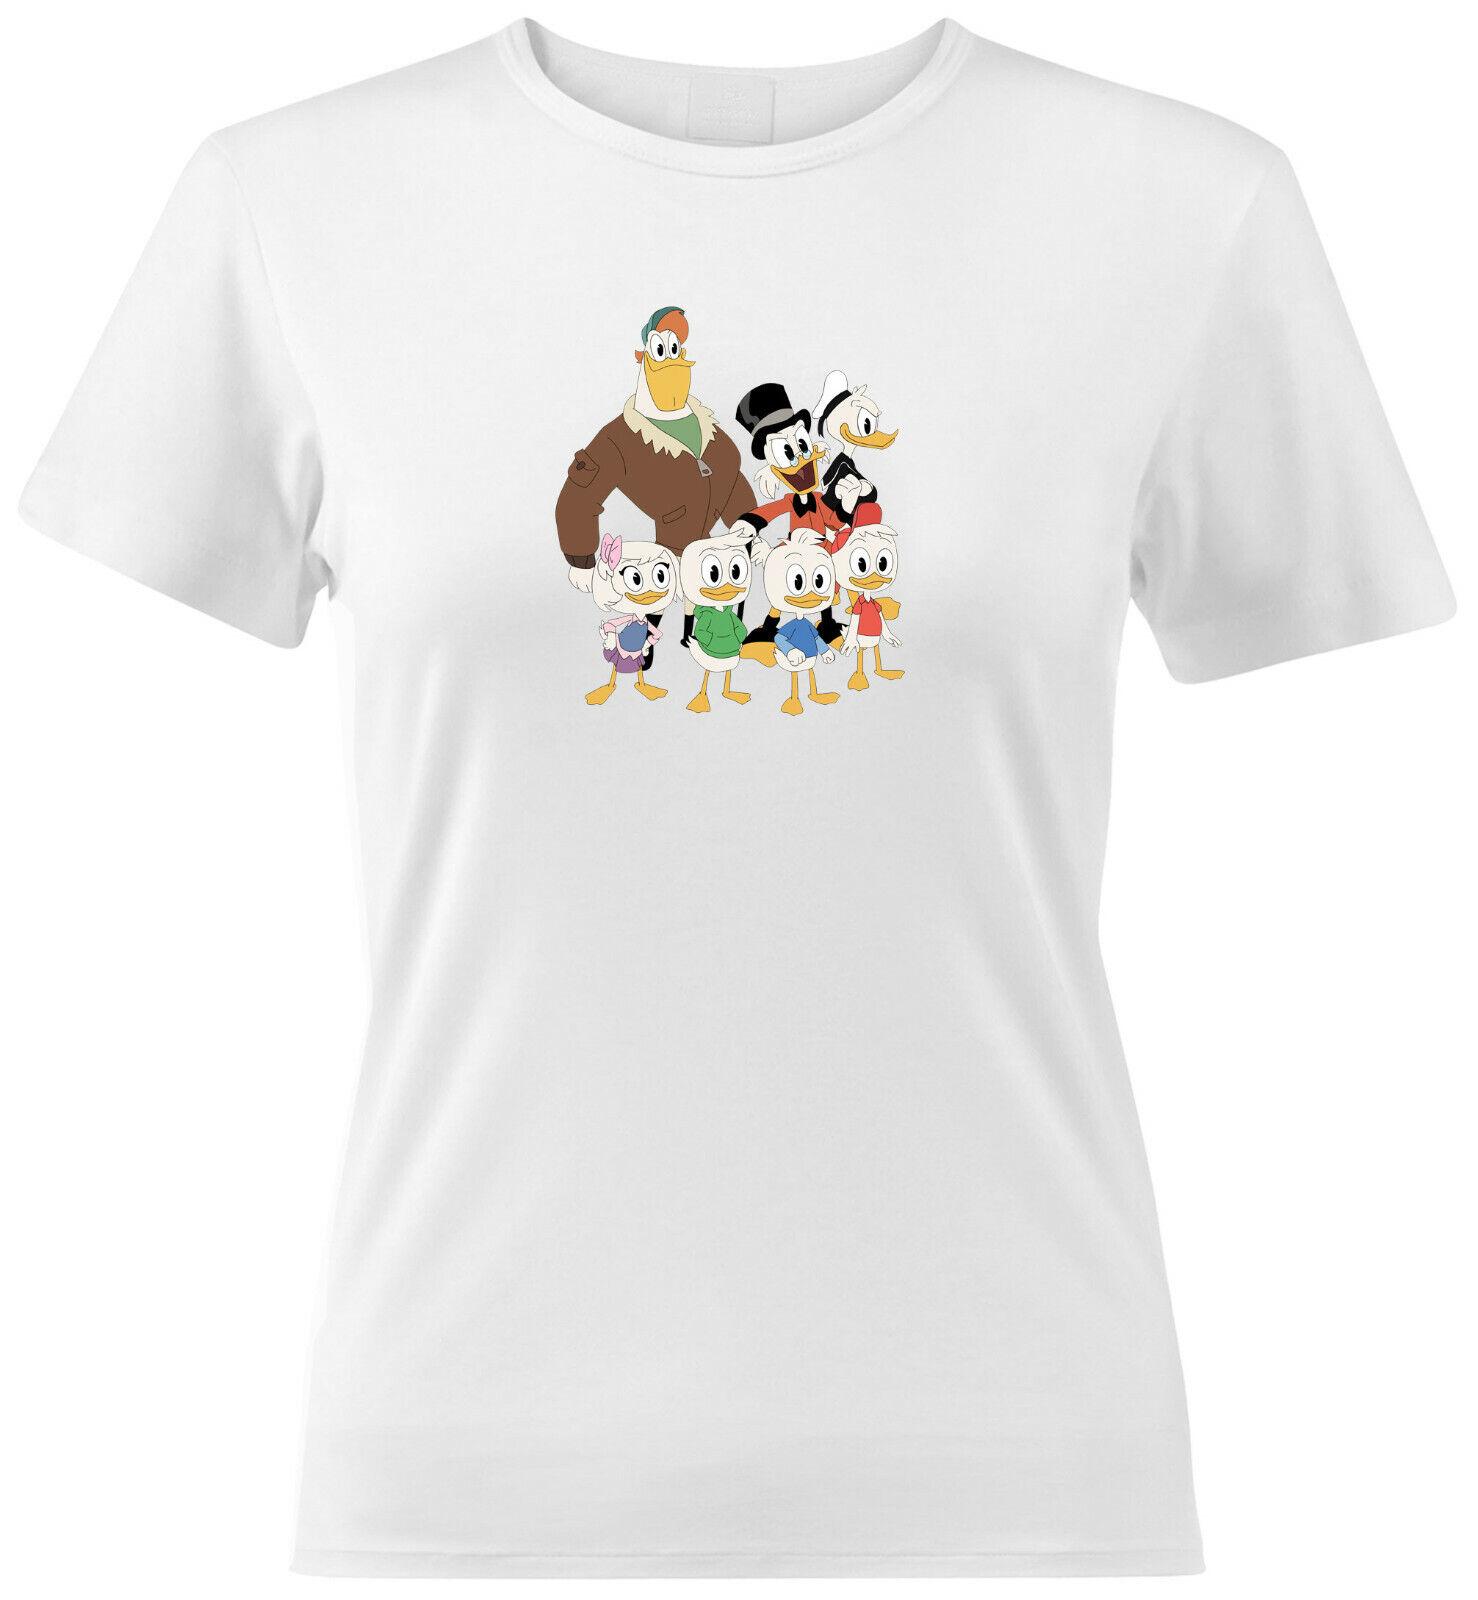 Dewey /& Louie Women Junior Girl V-Neck Short Sleeve Top Tee T-Shirt Details about  /Huey